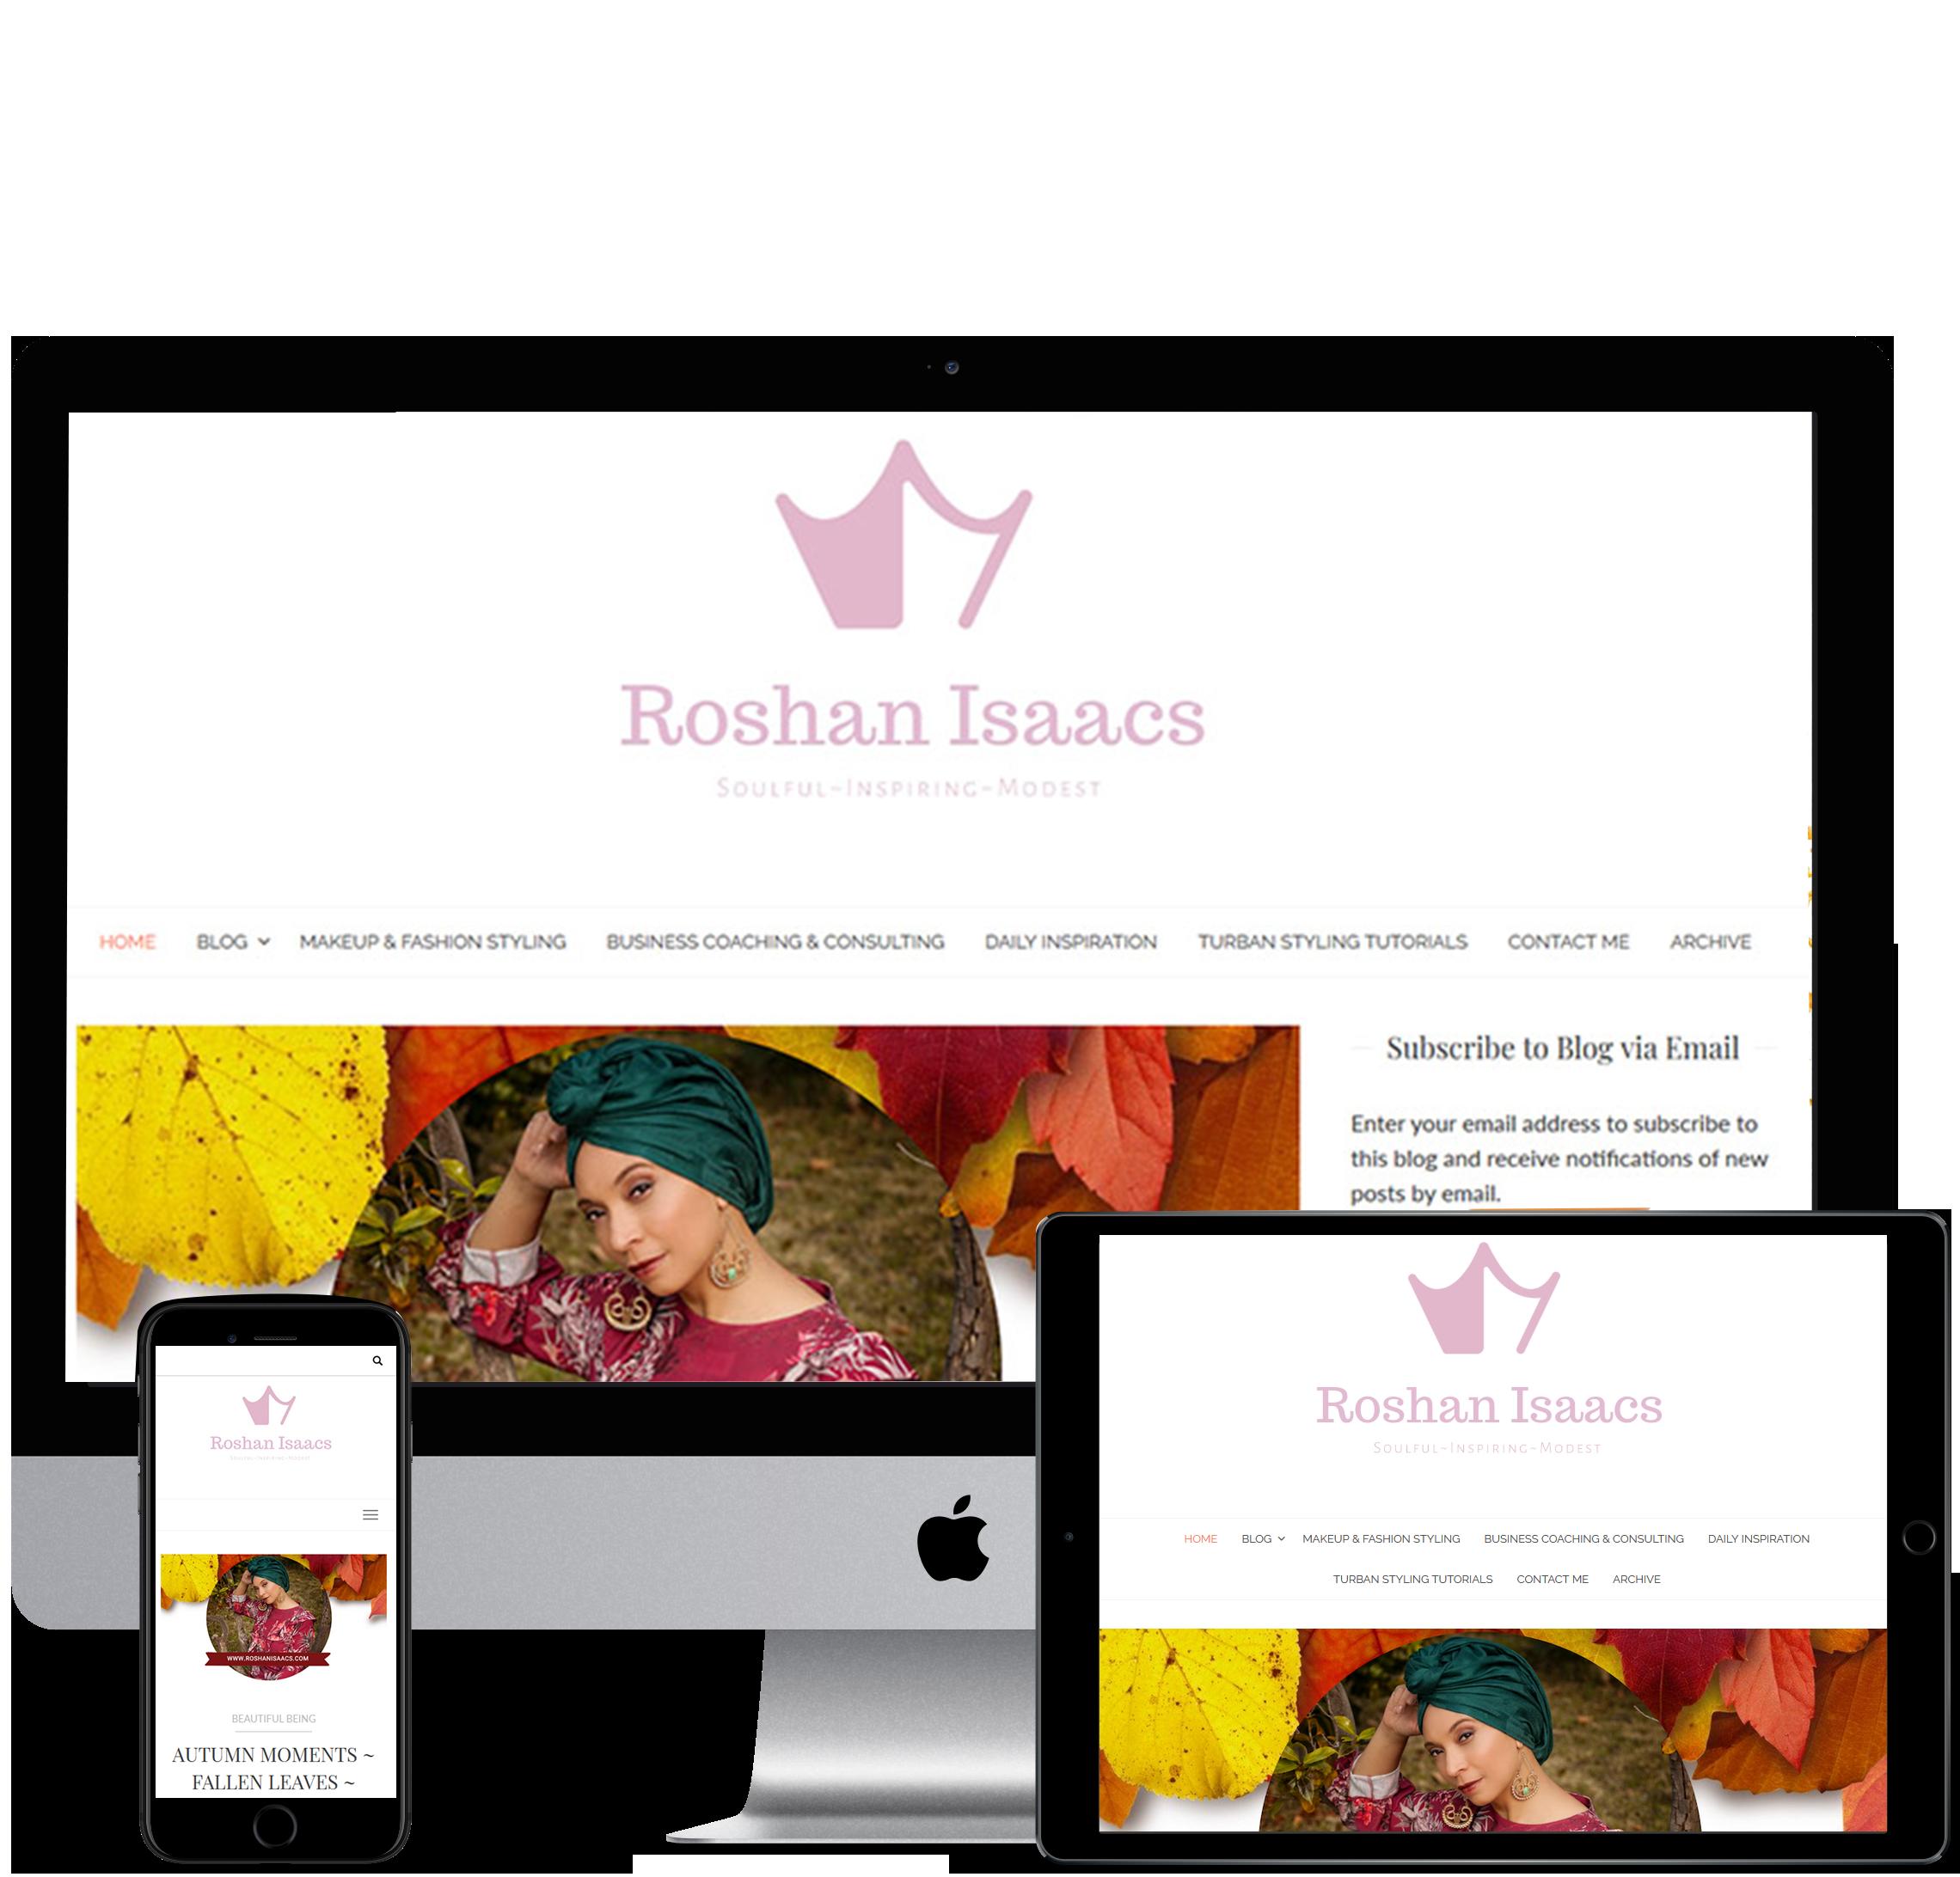 Website design for Roshan Isaacs. Website for Fashion blogger